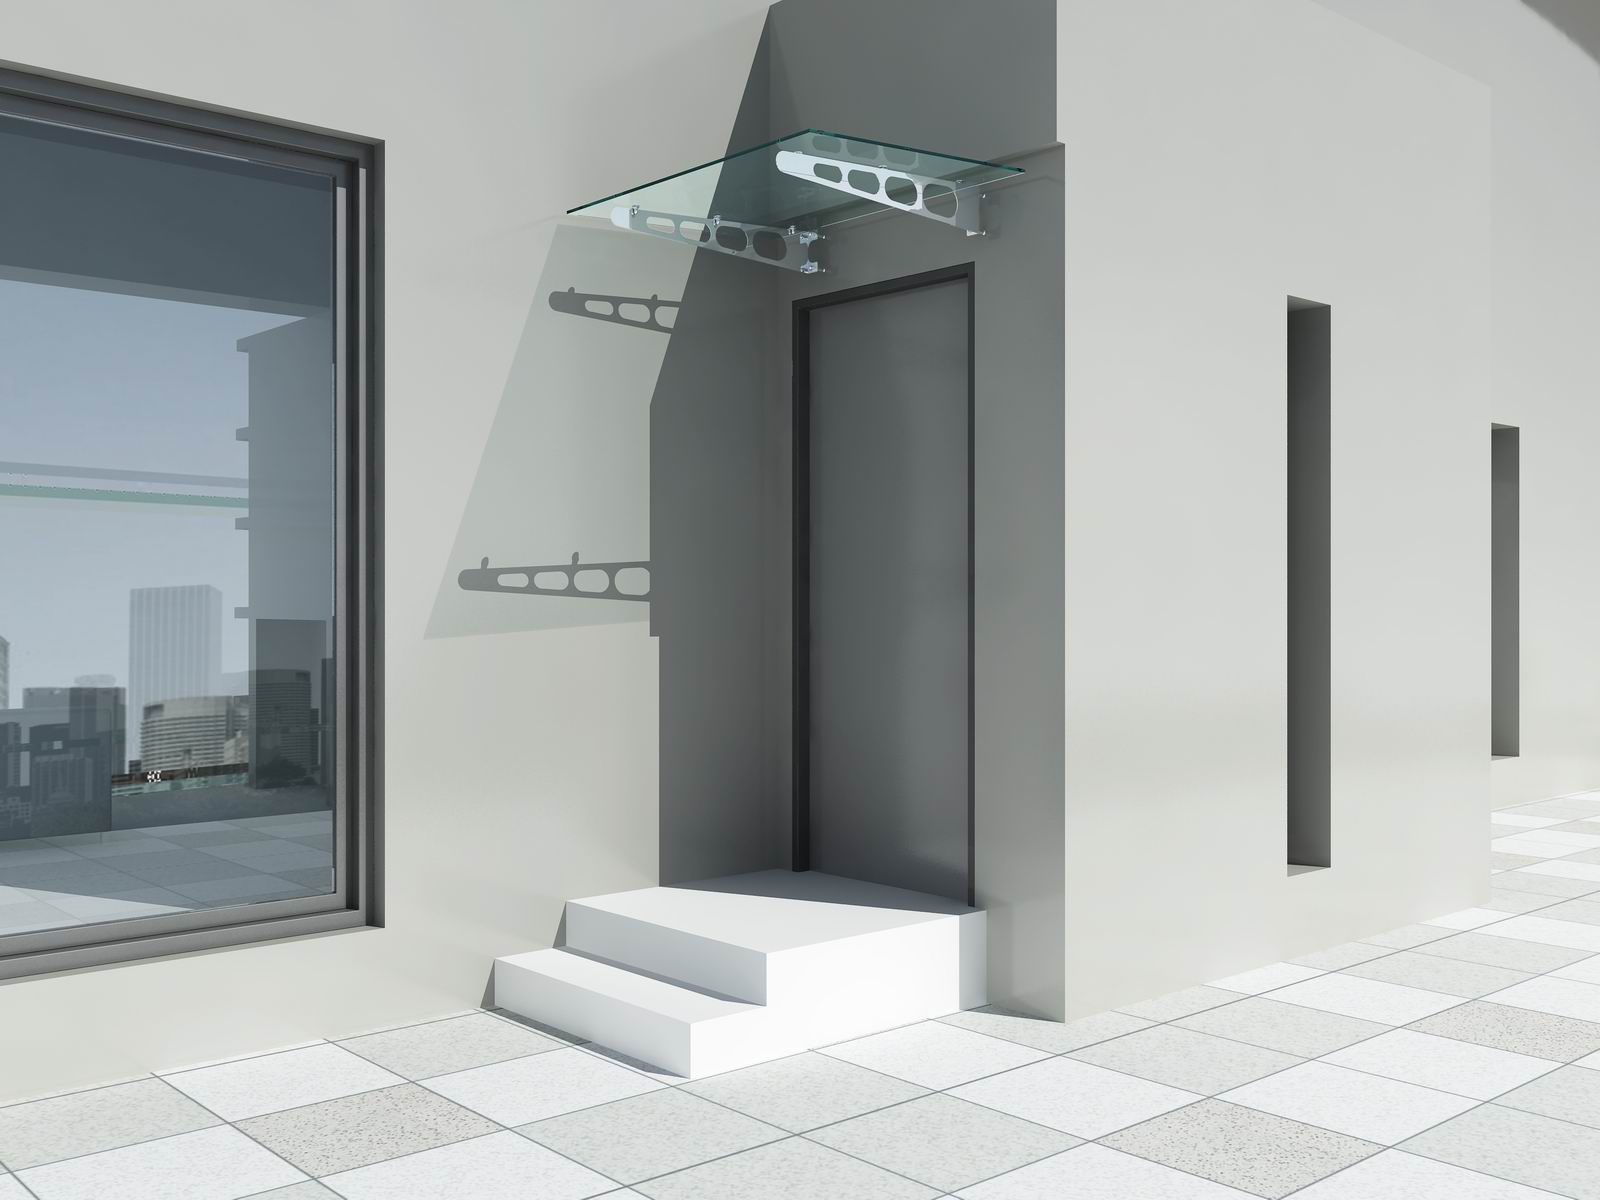 glasvordach vordach glas haust r dach vd02 ebay. Black Bedroom Furniture Sets. Home Design Ideas